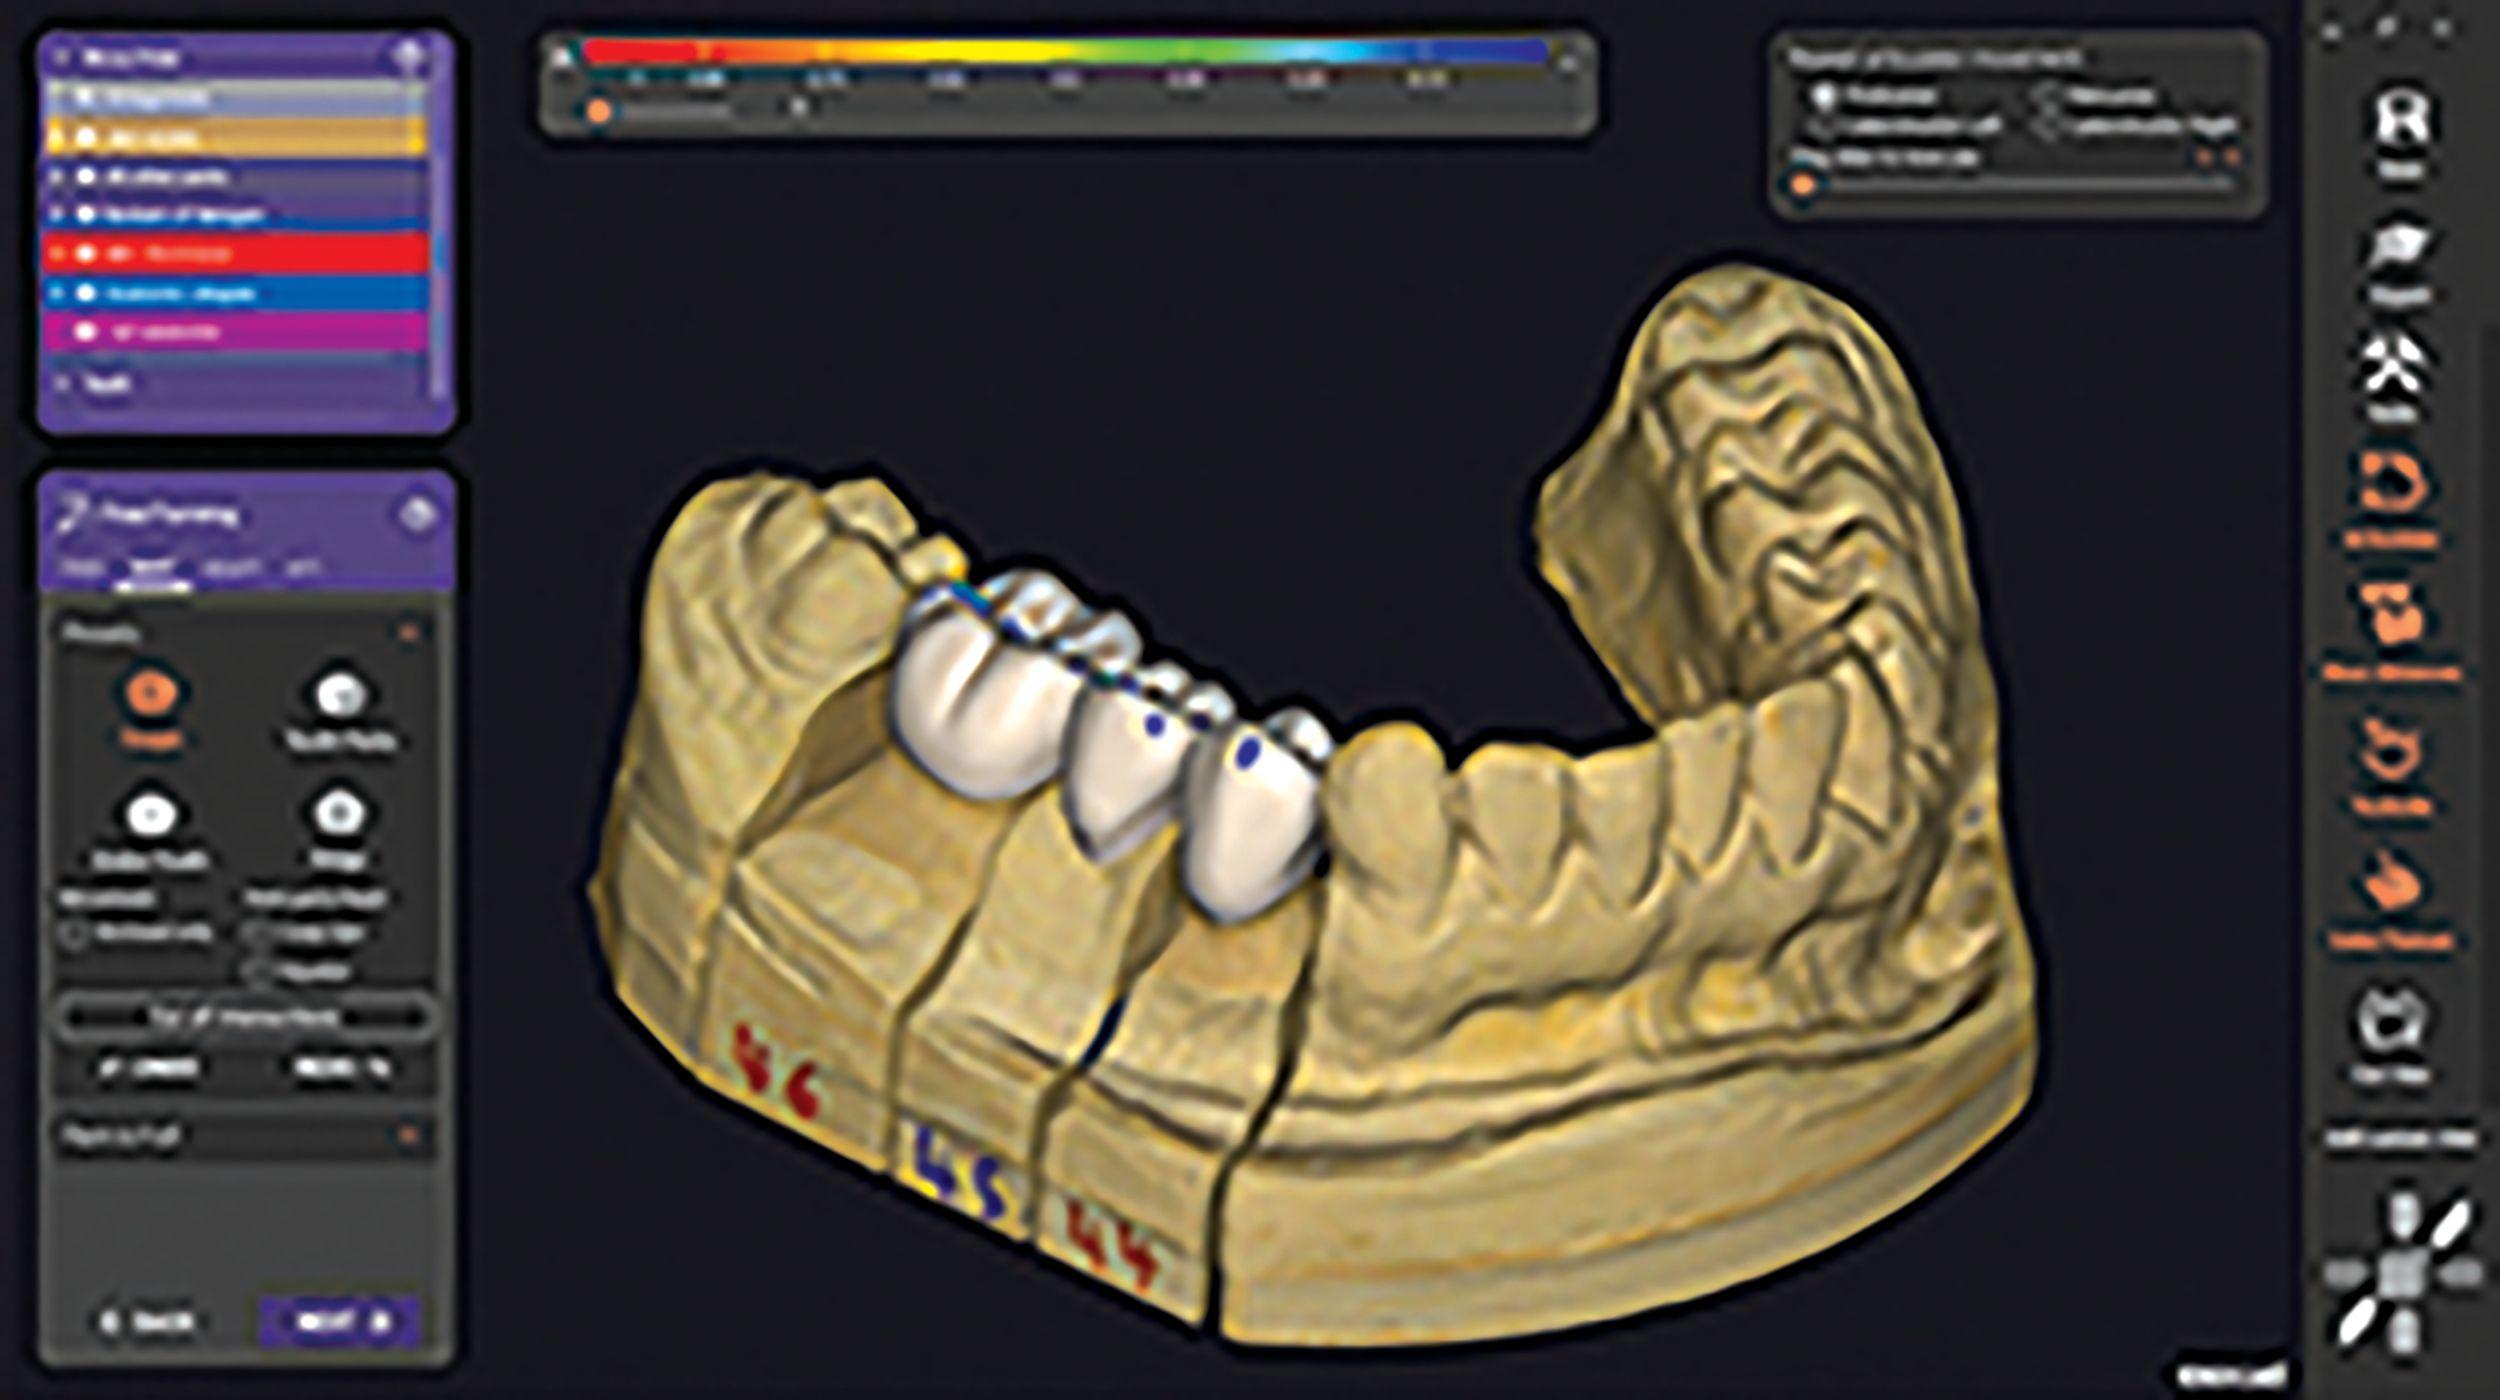 DentalCAD 3.0 Galway